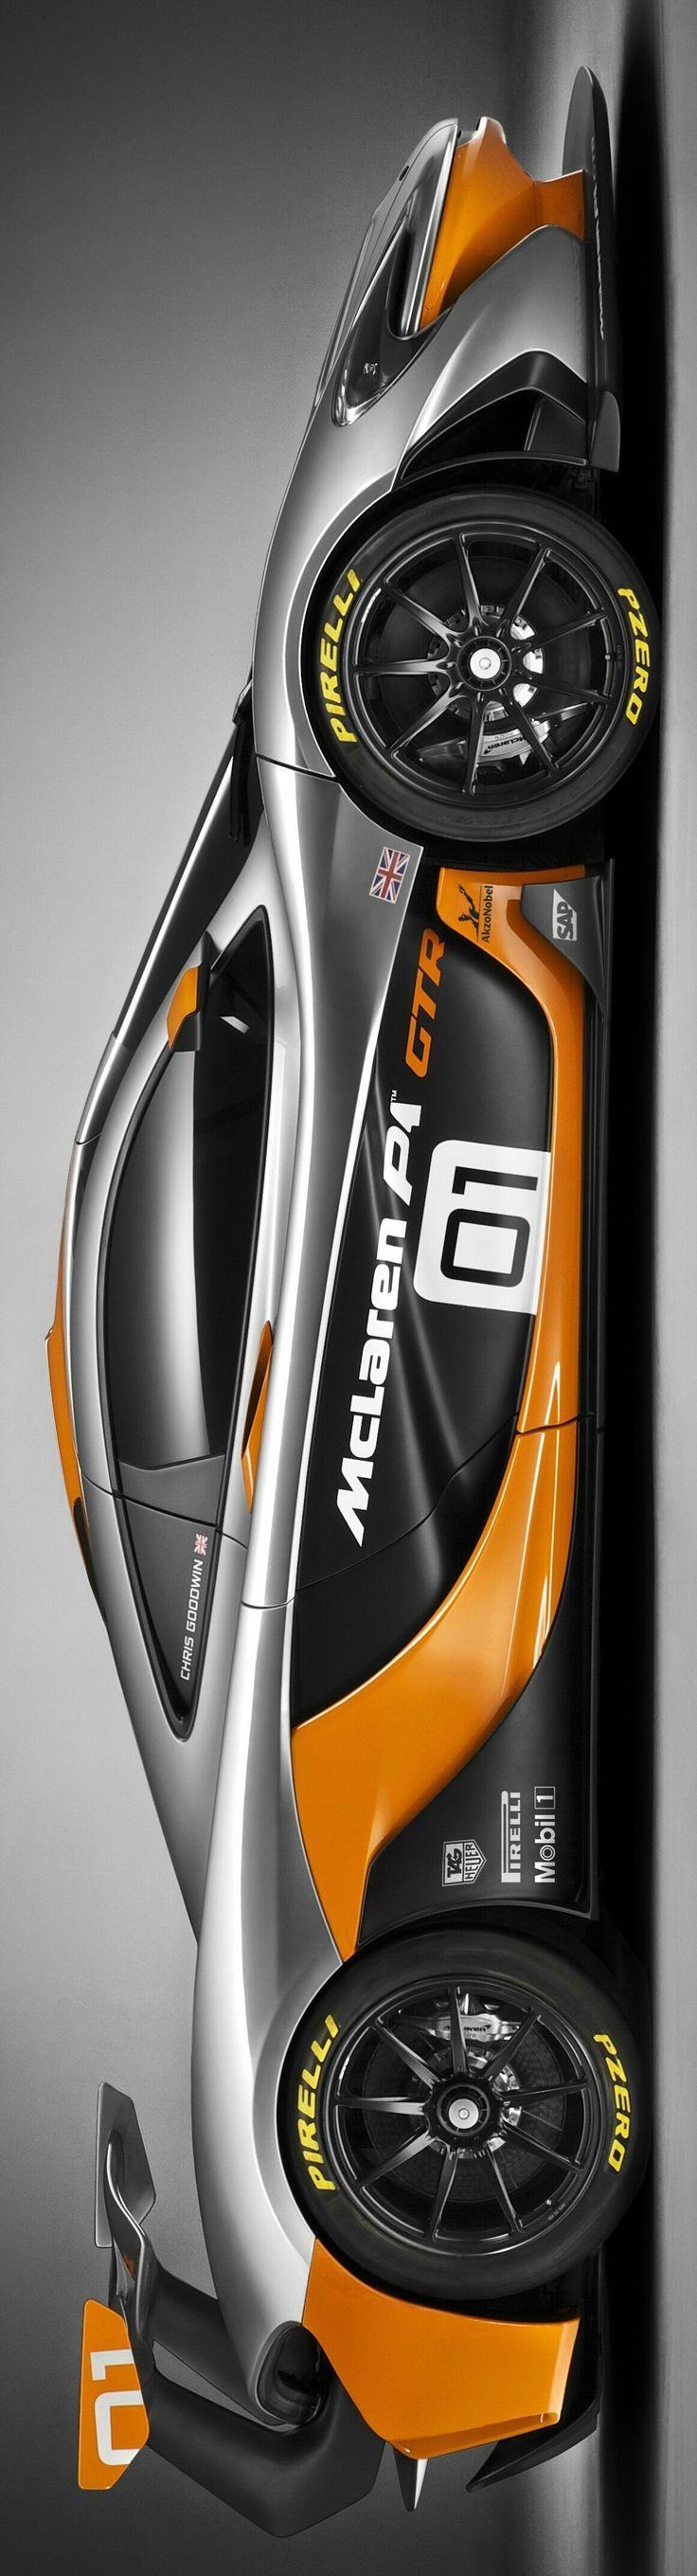 McLaren P1 GTR by Levon - https://www.luxury.guugles.com/mclaren-p1-gtr-by-levon-13/